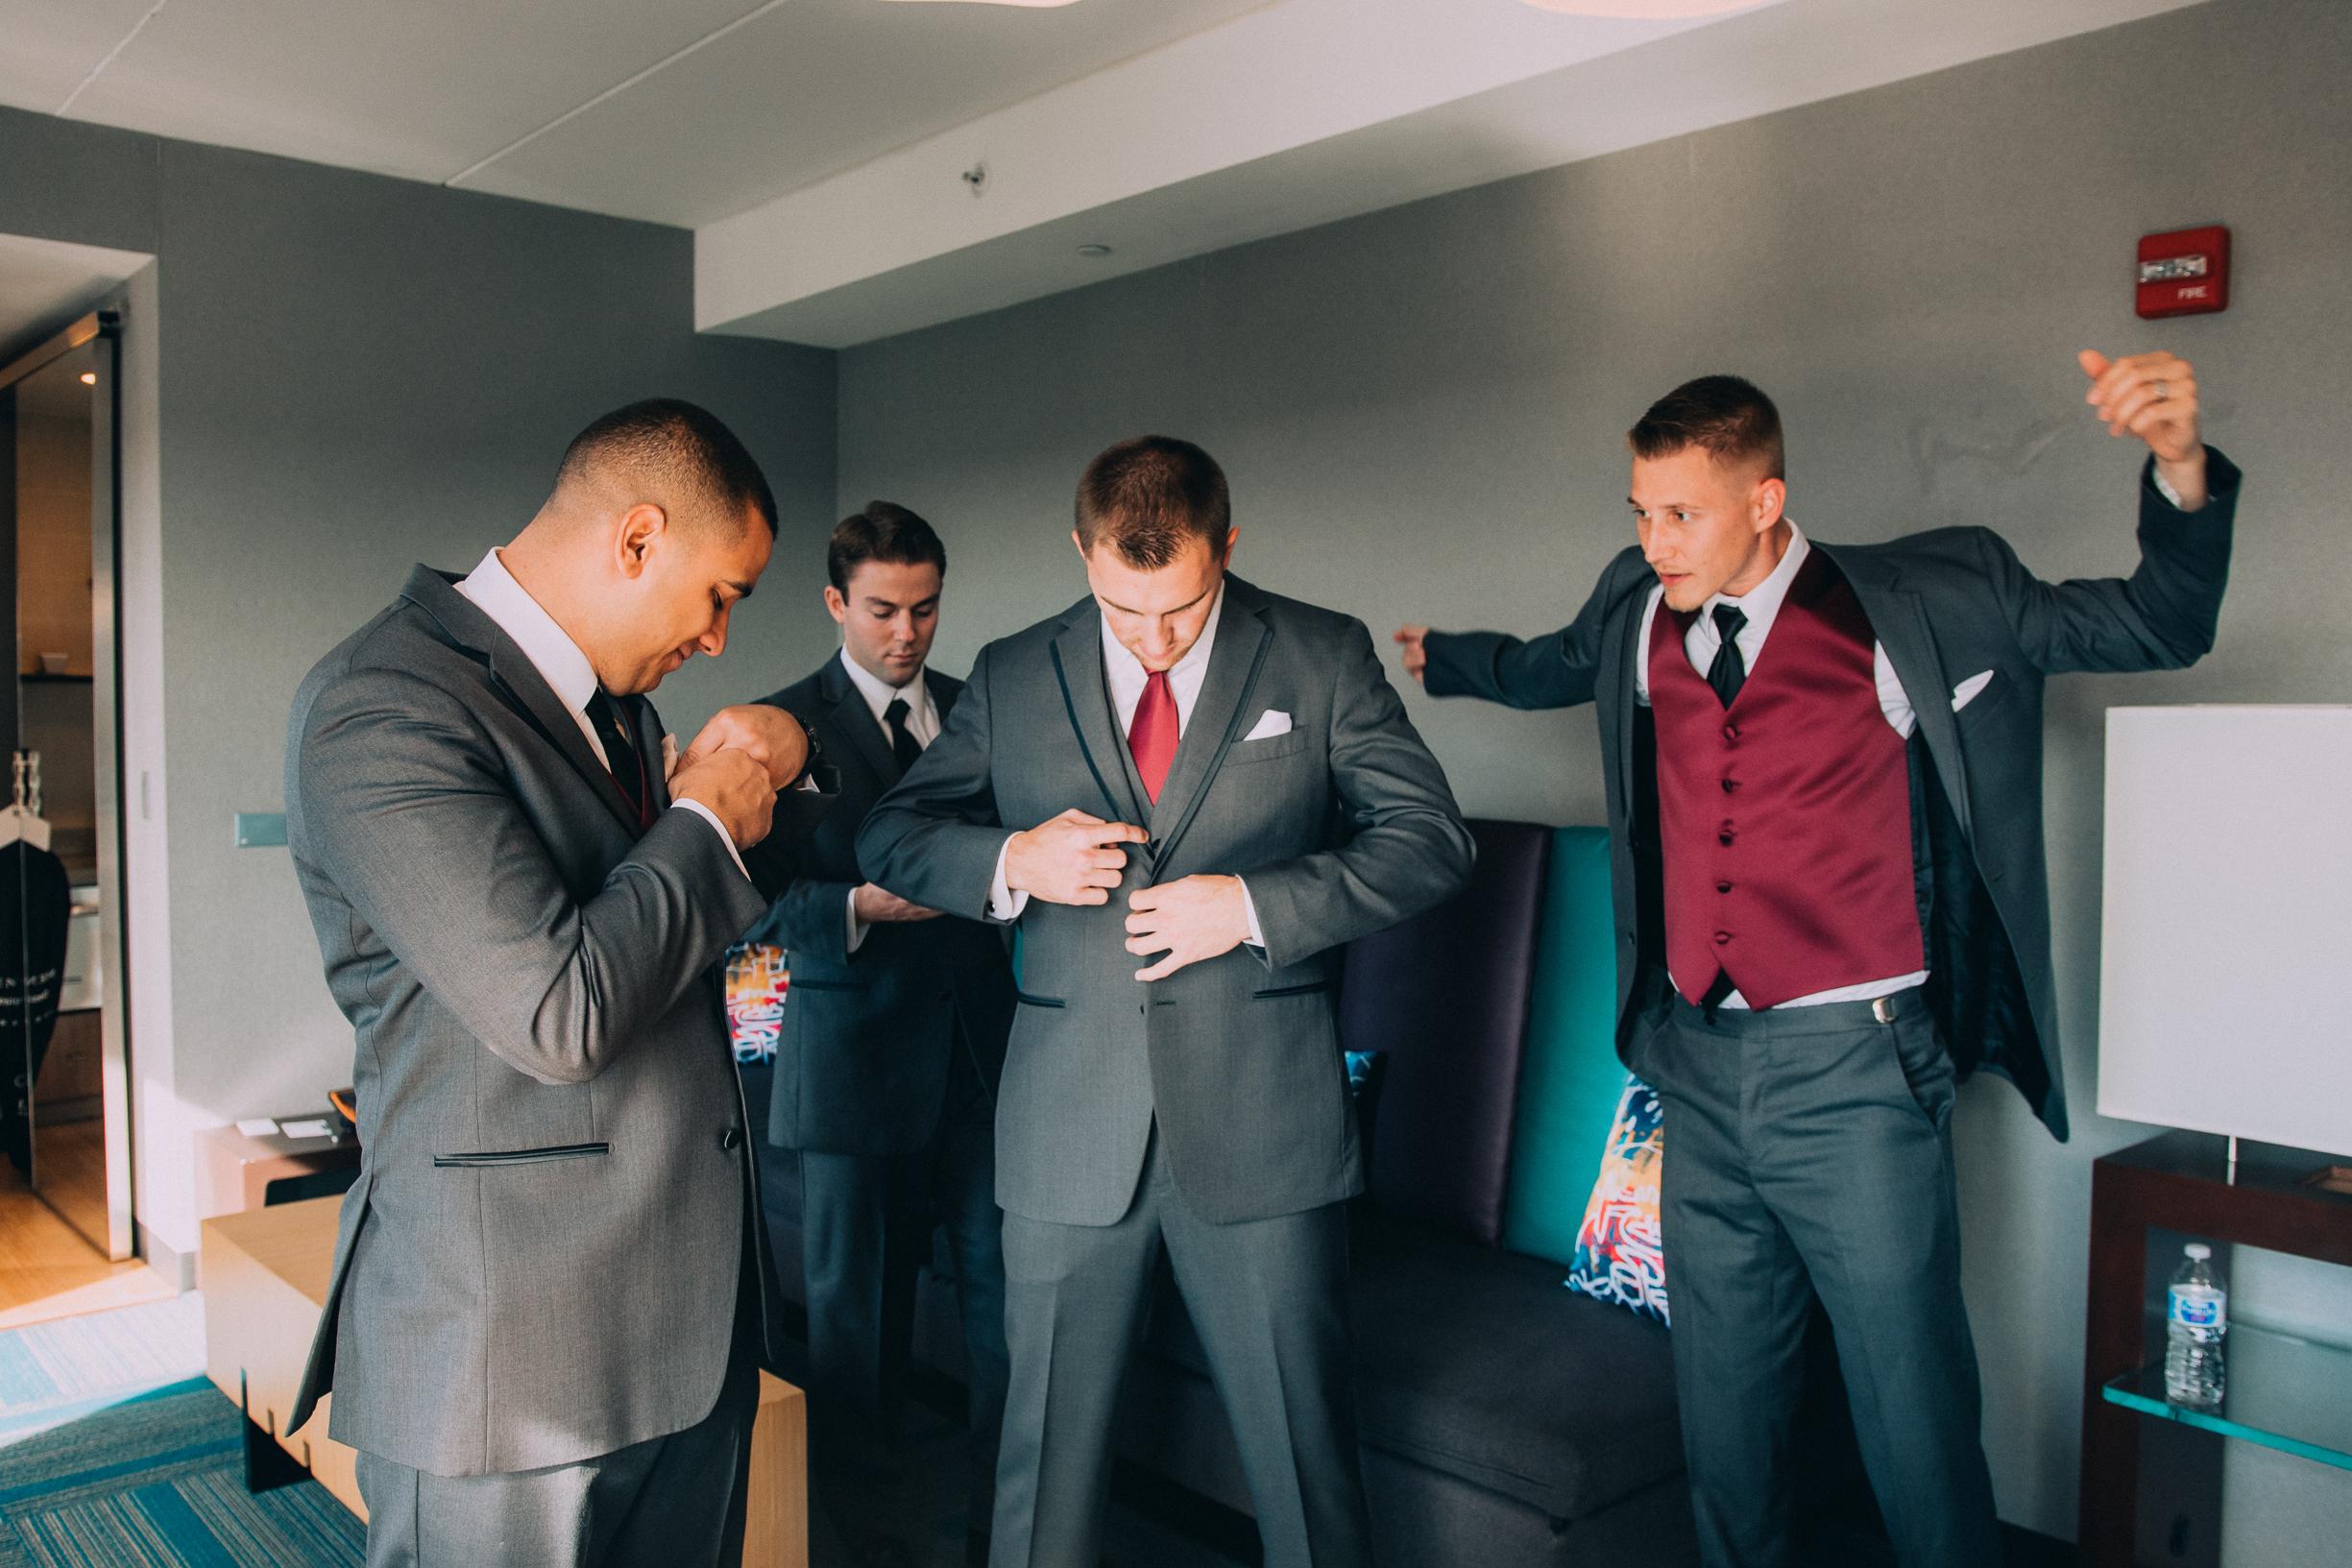 A&S_wedding-0528.jpg